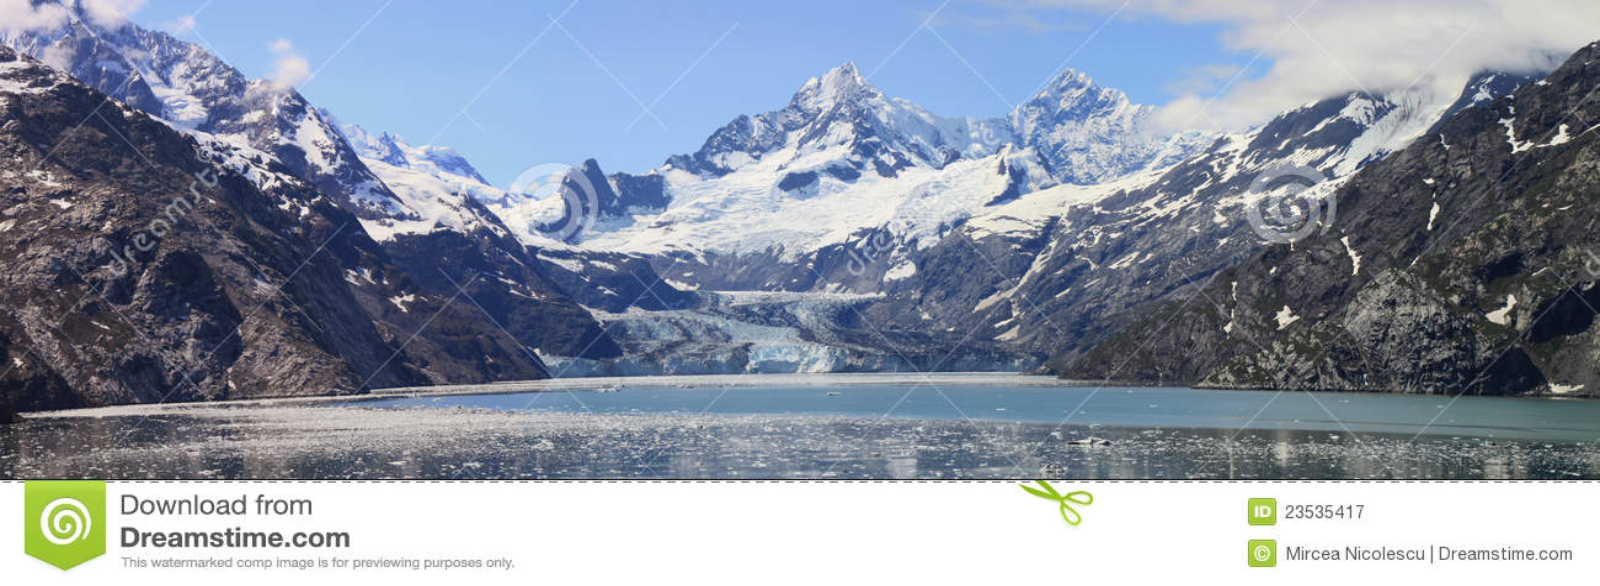 Panorama de compartiment de glacier